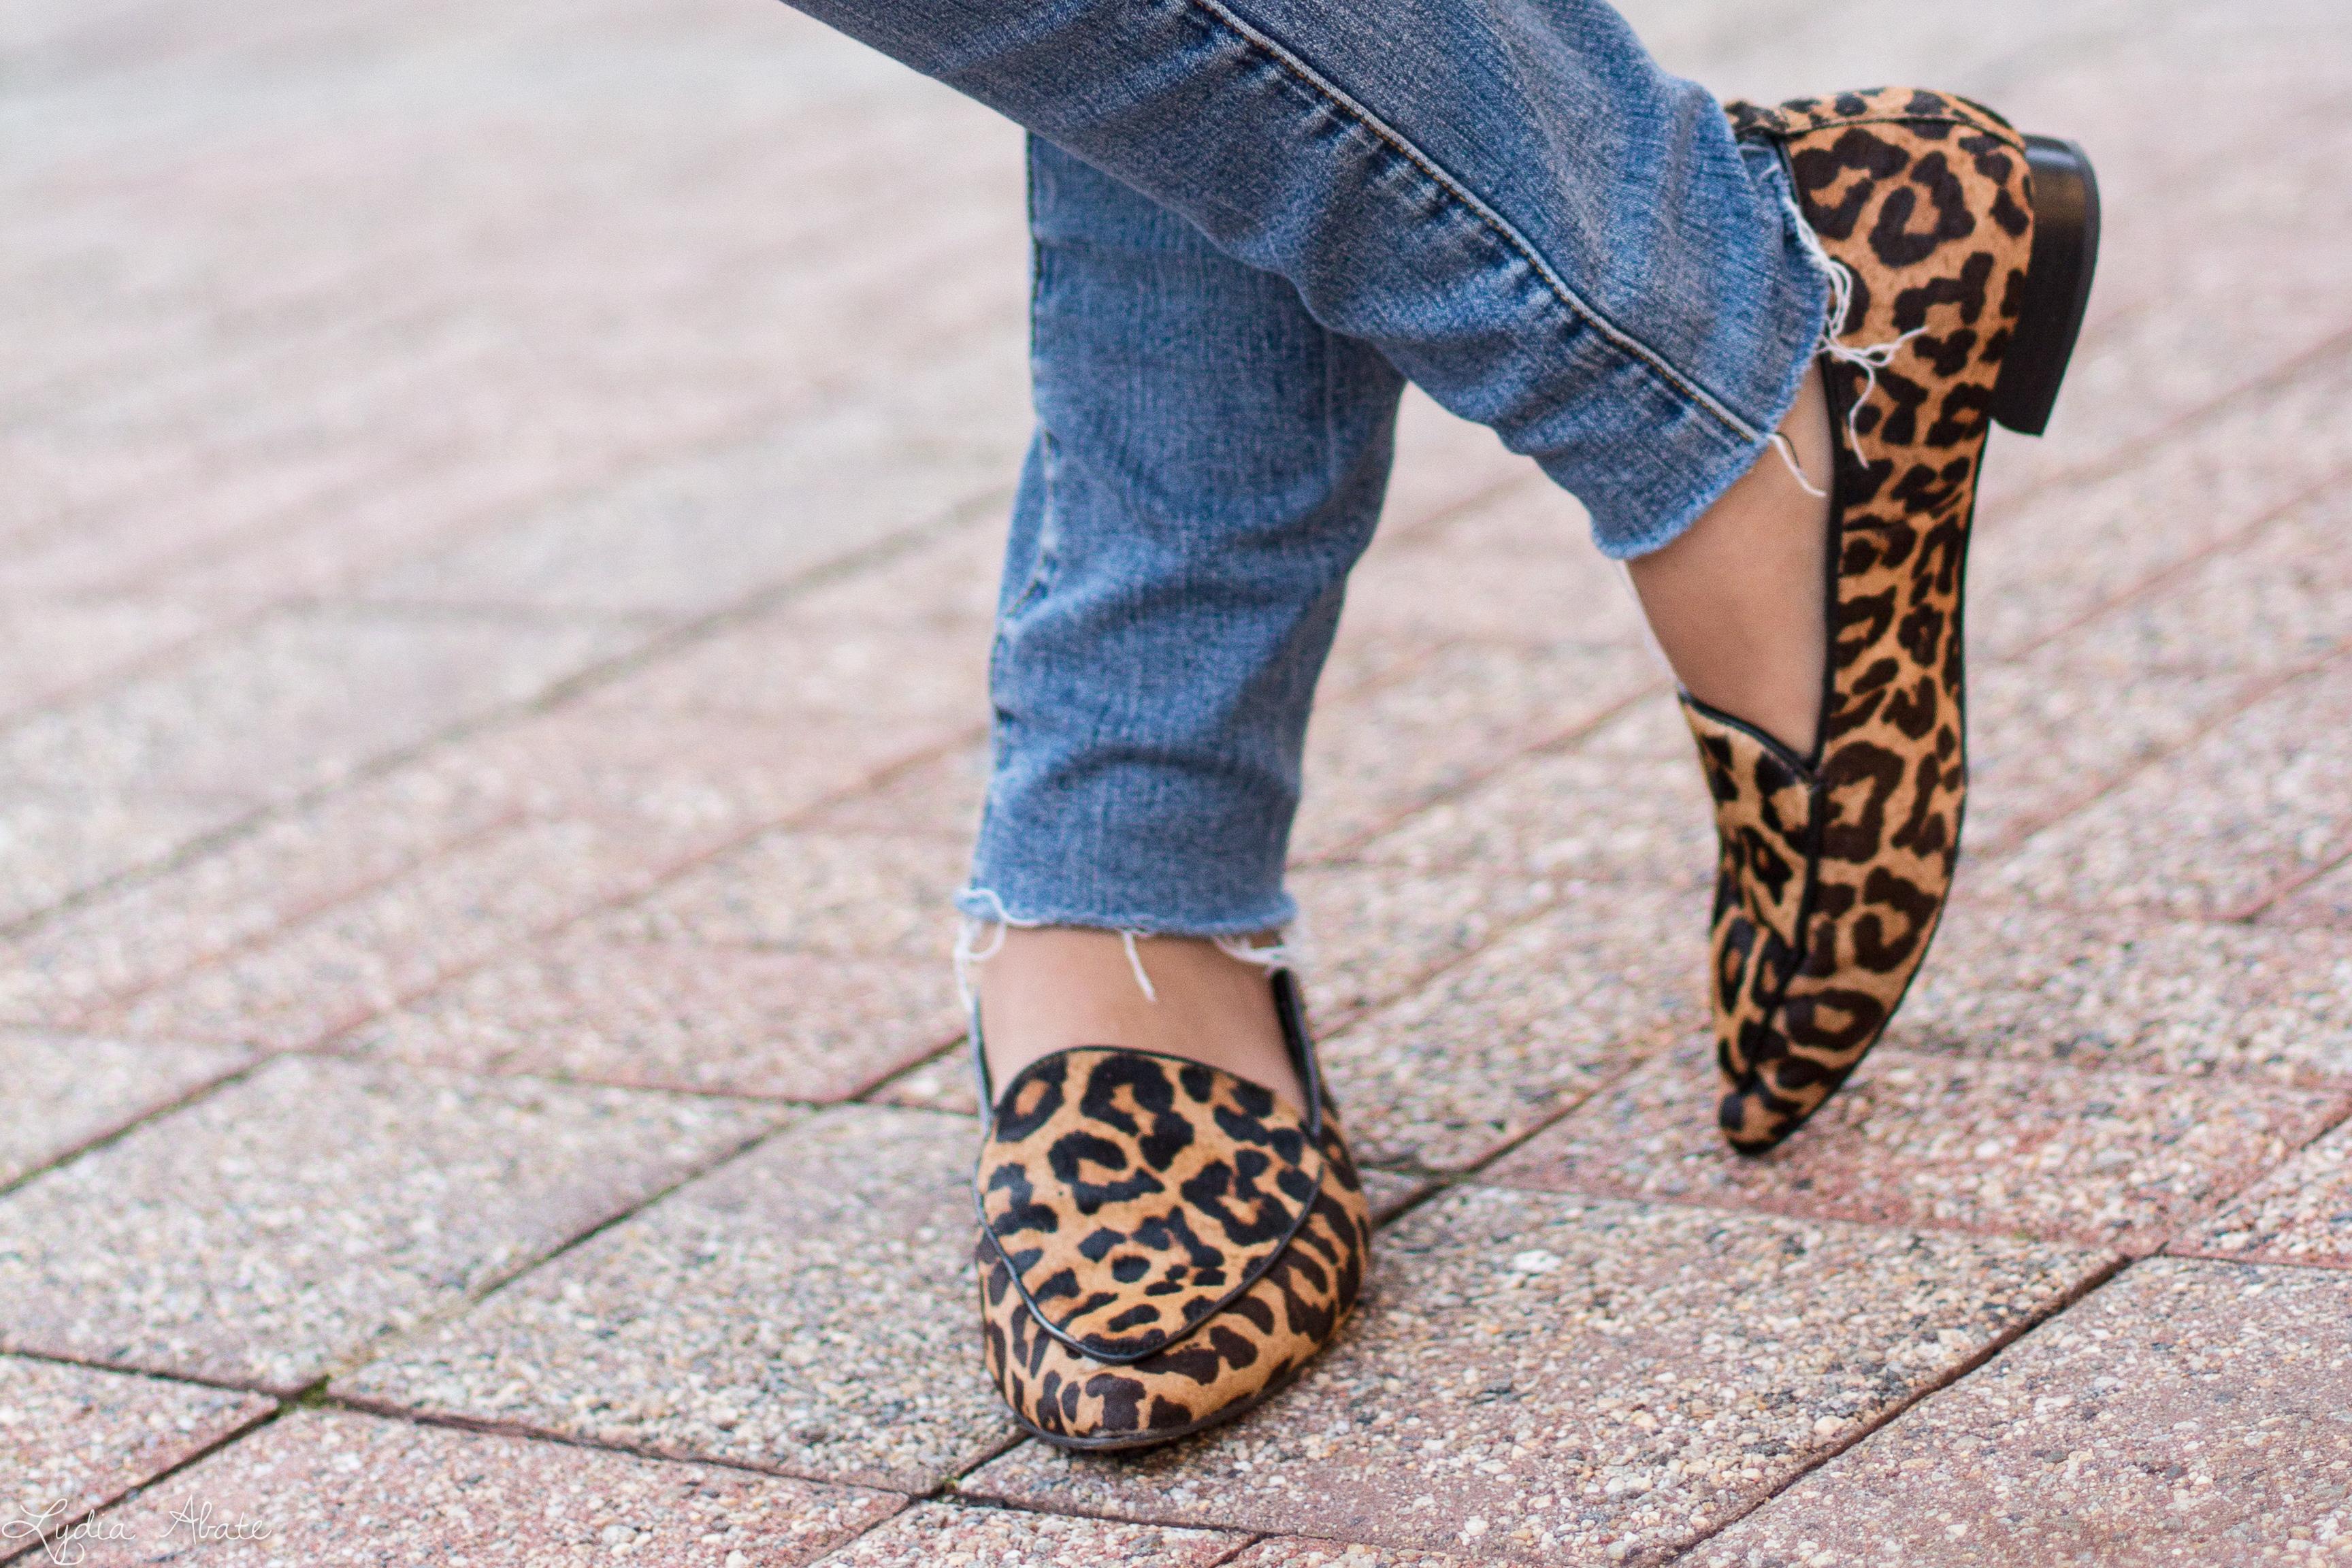 rust turtleneck, suede trench, leopard loafers, cream wool fedora-1.jpg